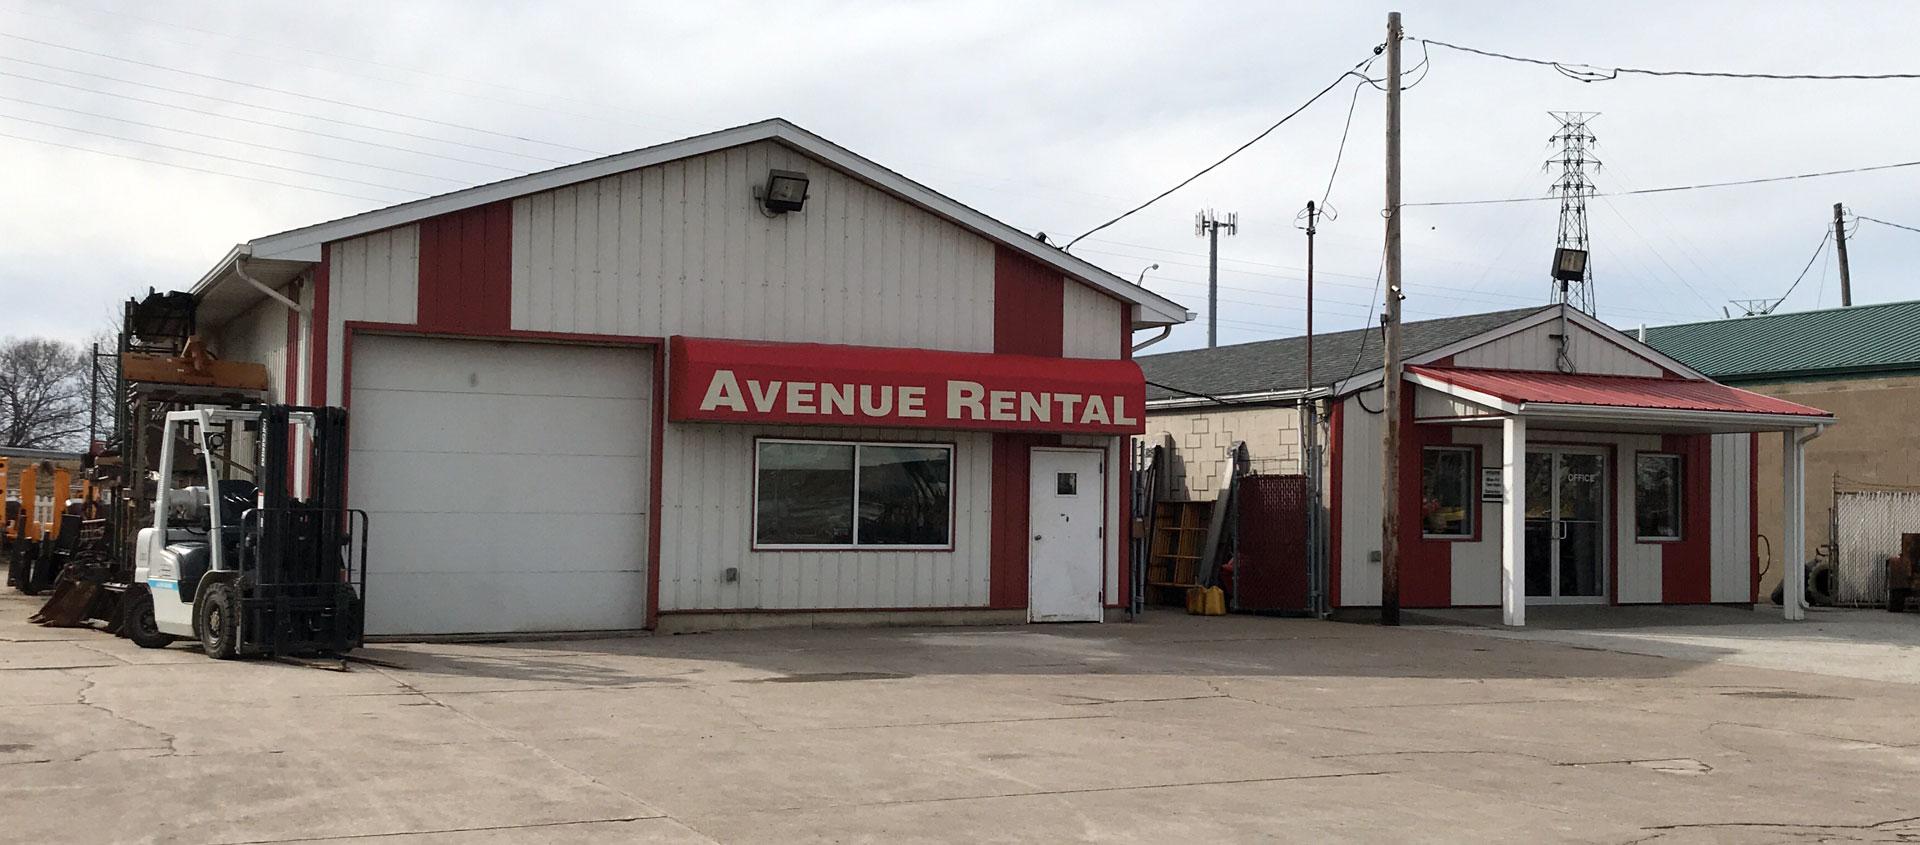 Home Avenue Rental Inc